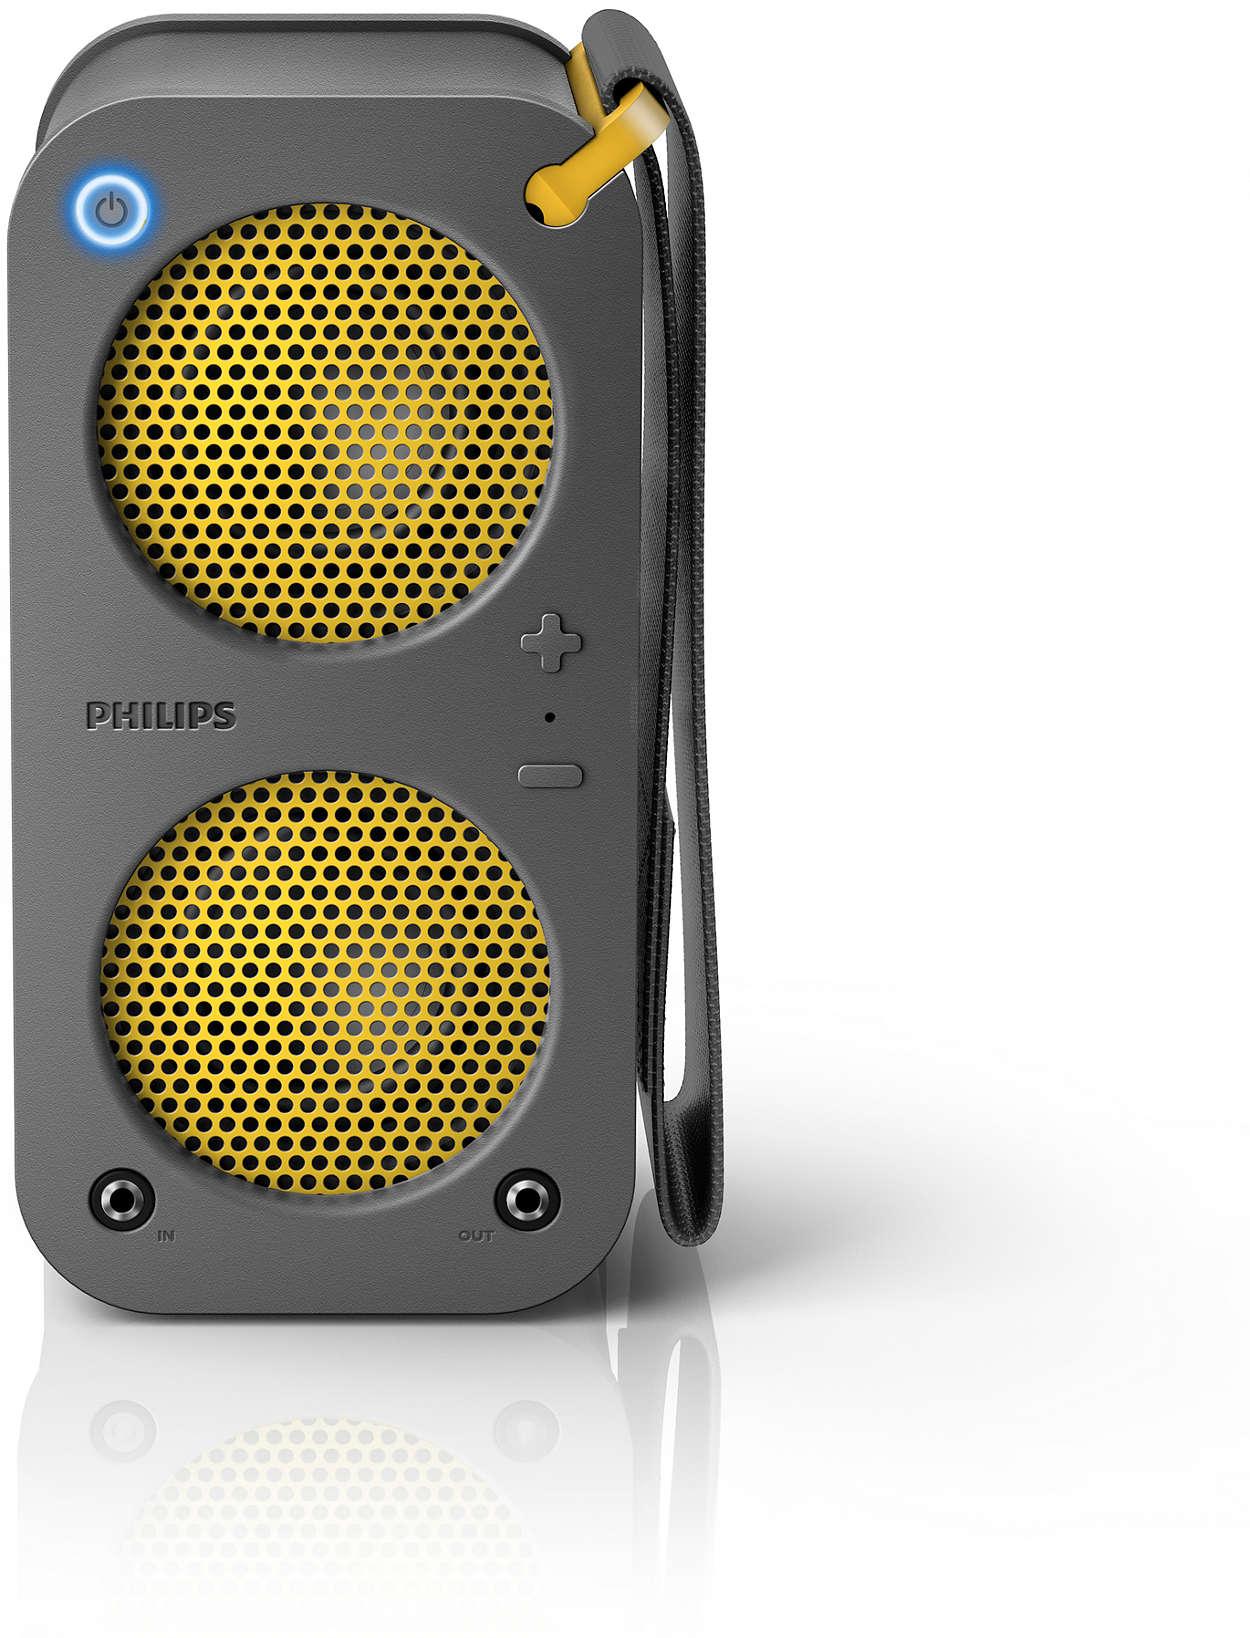 Geweldig geluid · Robuust · Netwerkfunctionaliteit